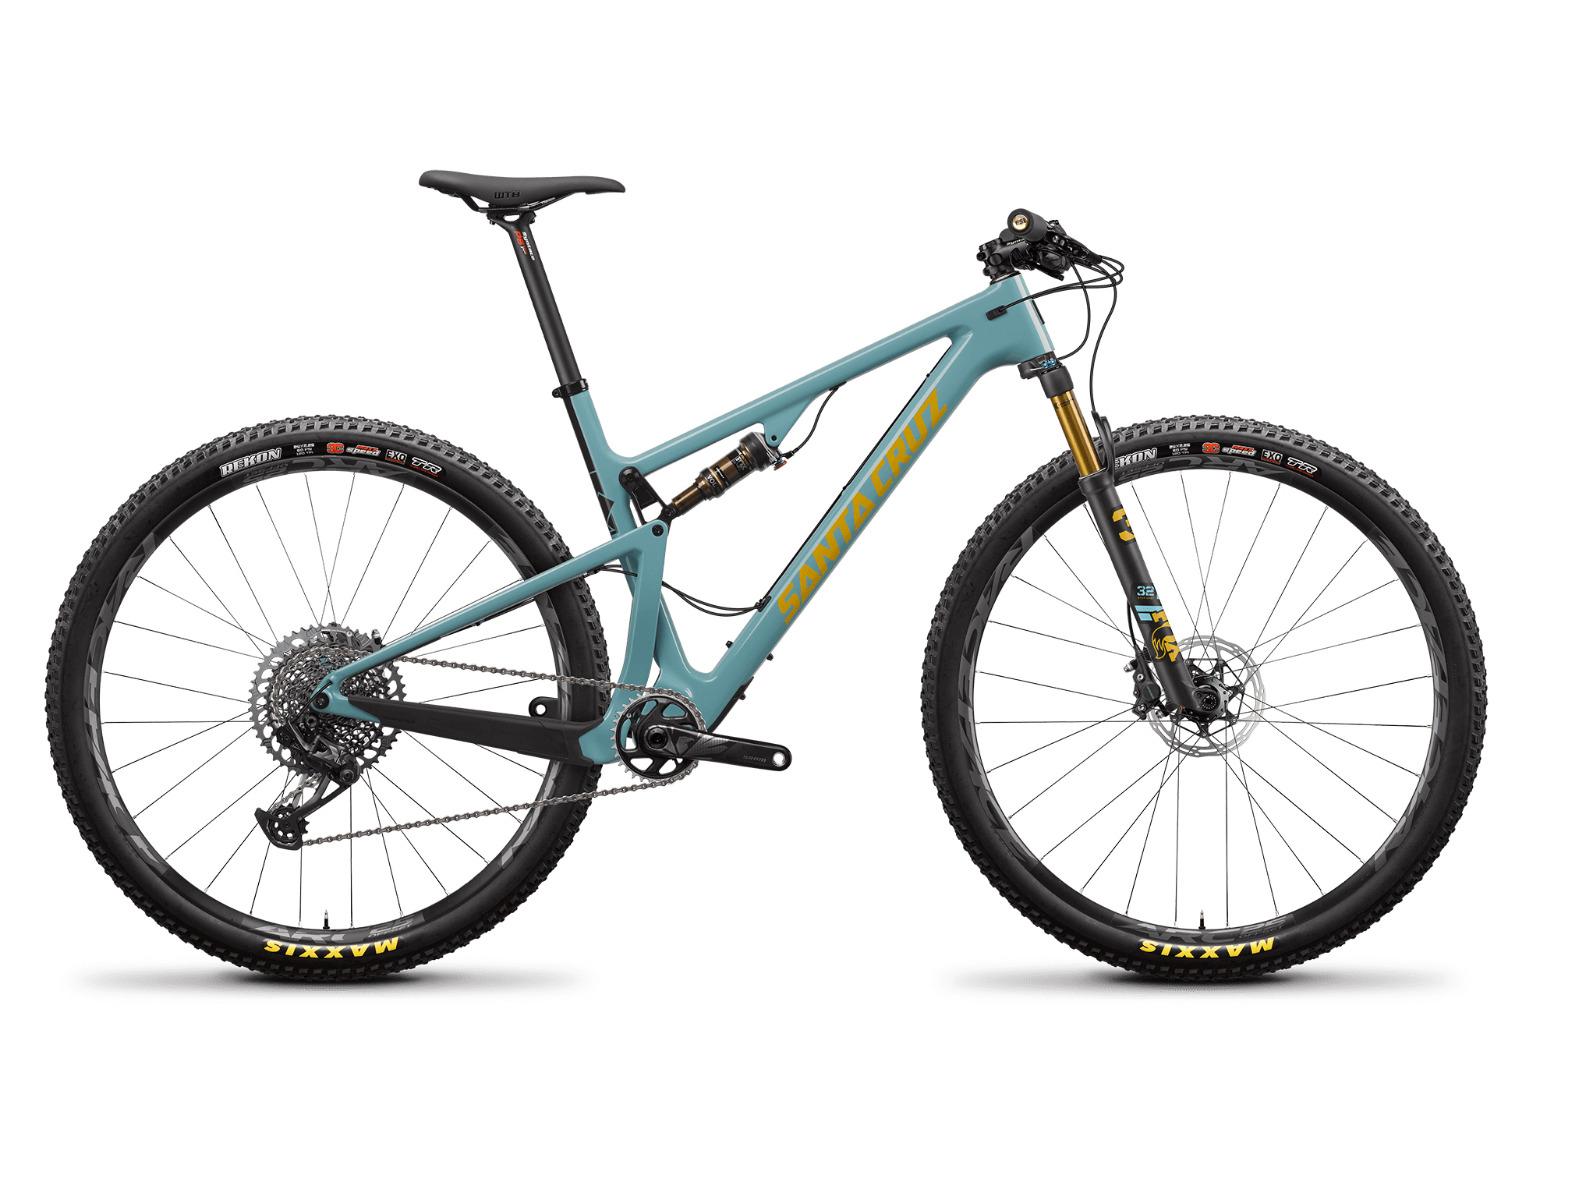 Santa Cruz Blur 3 CC X01 | mountainbike